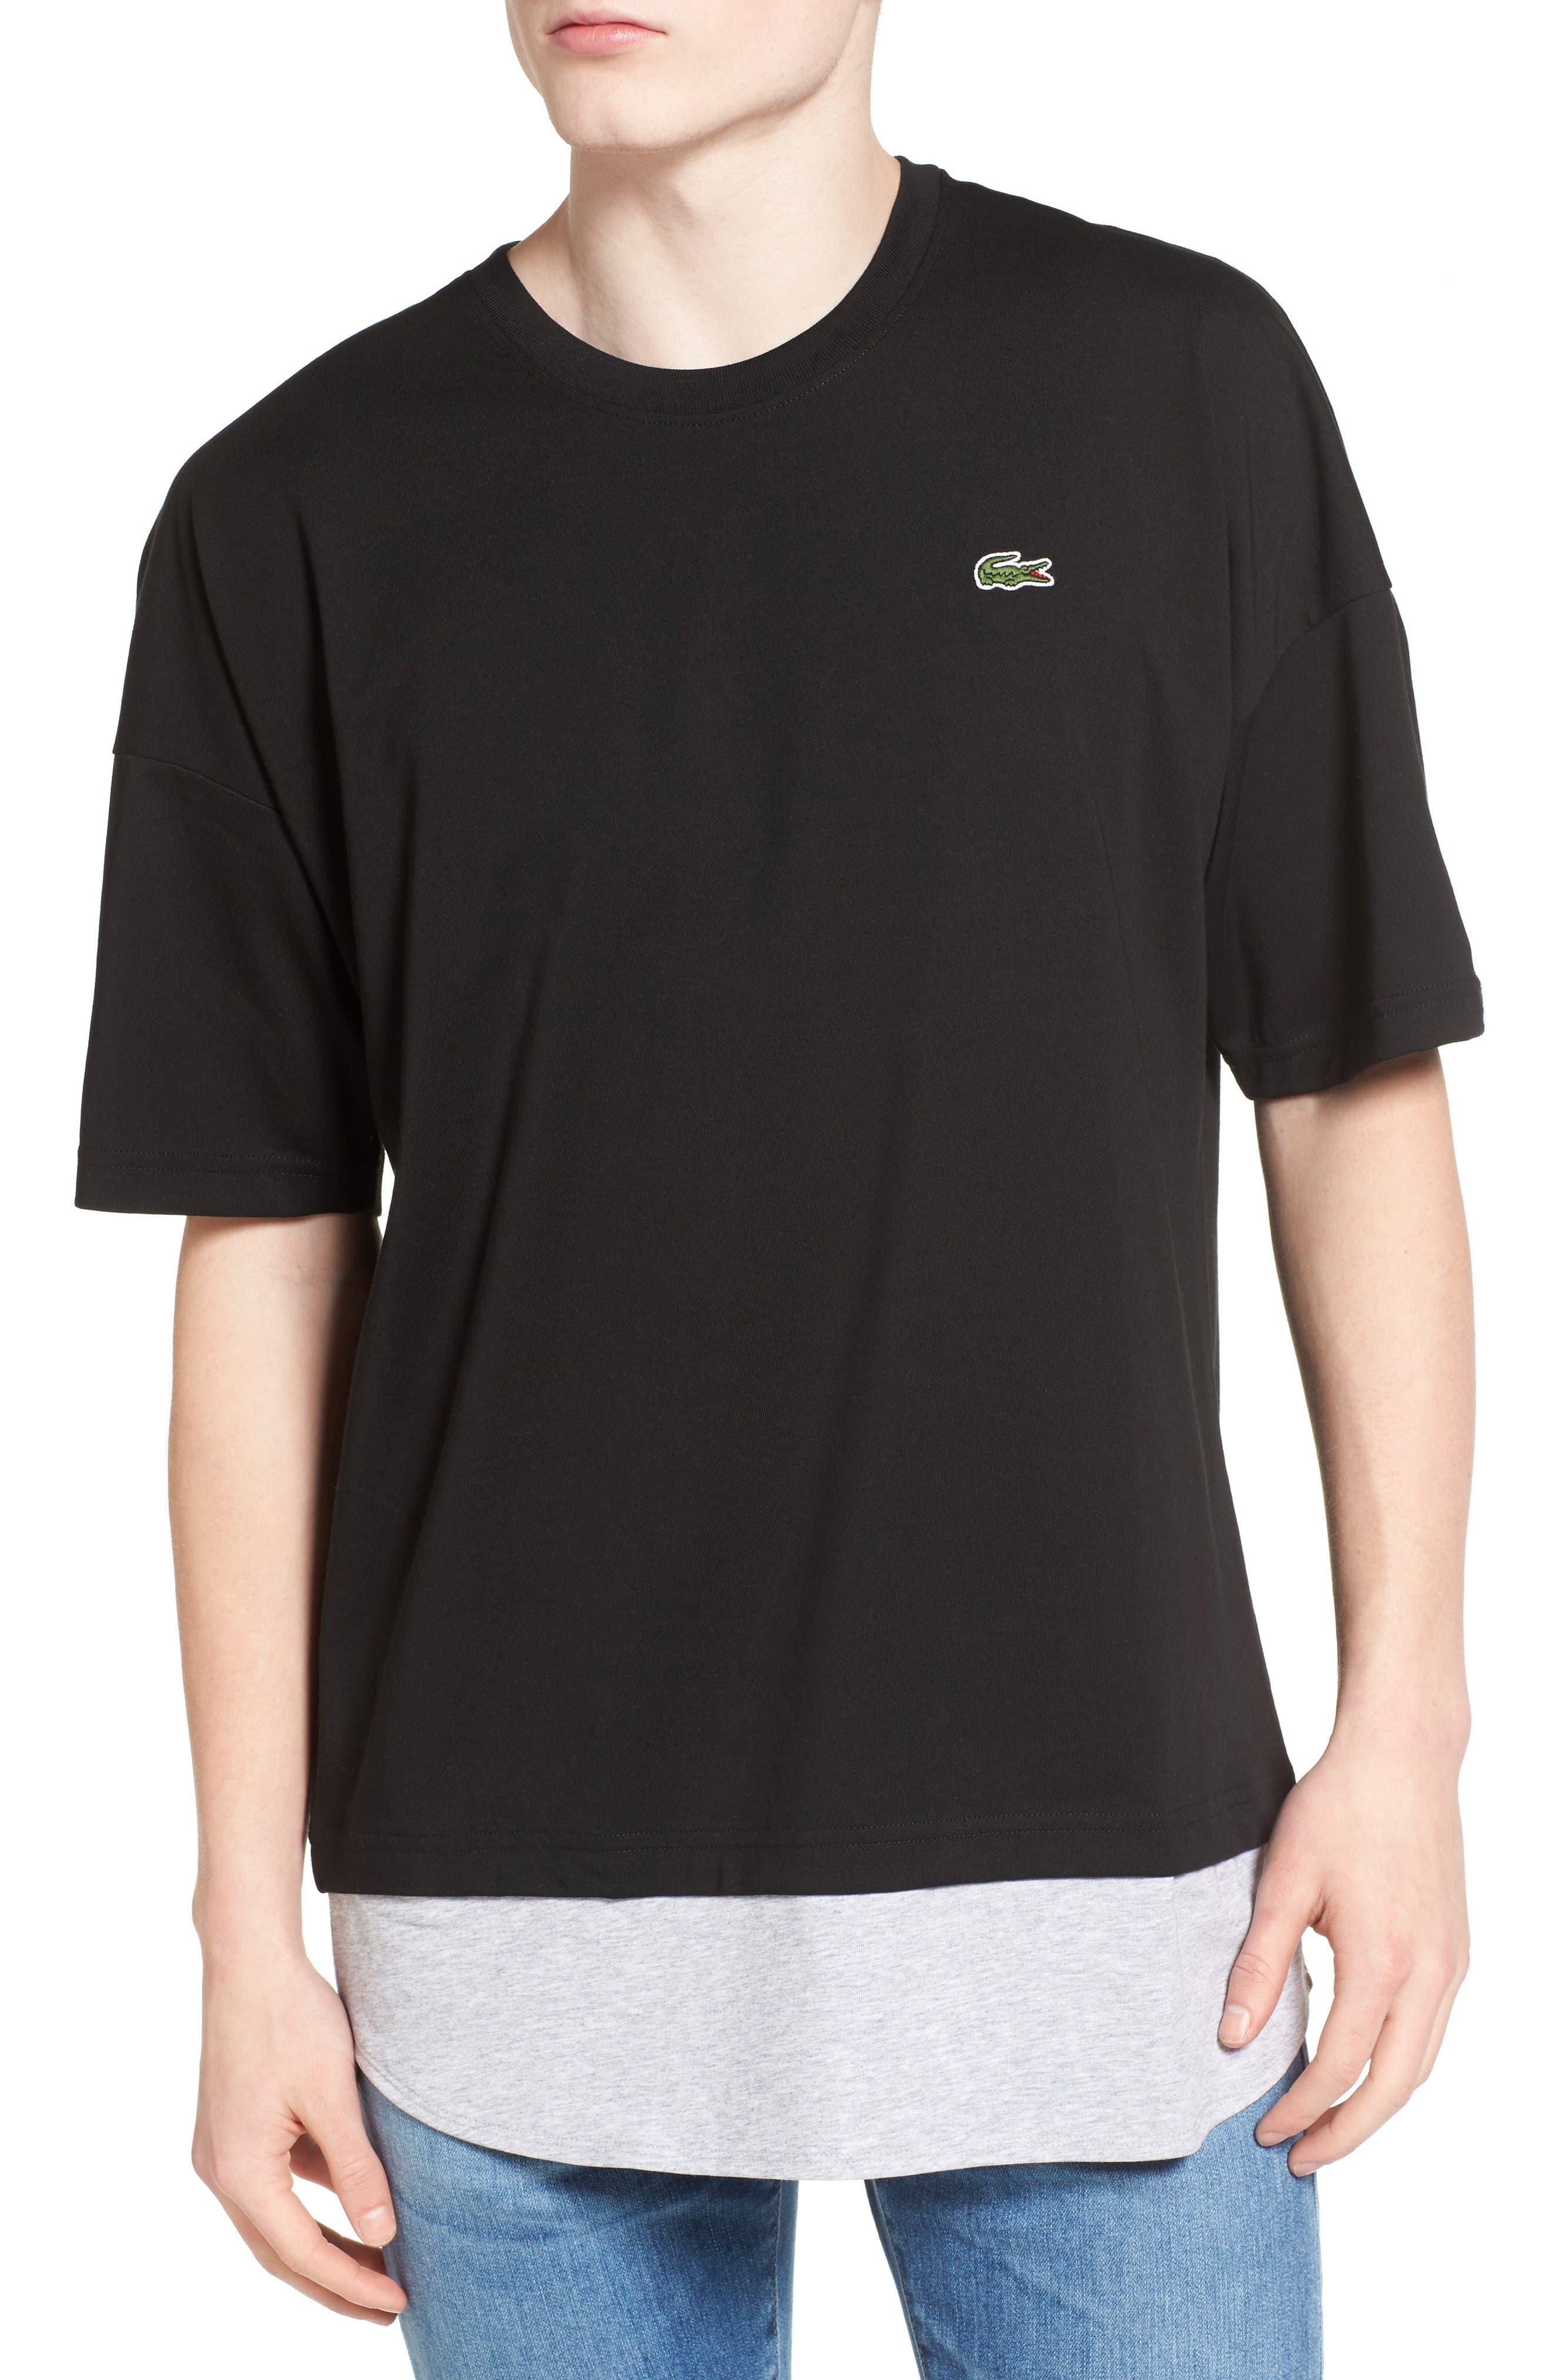 Alternate Image 1 Selected - Lacoste L!VE Mock Layer T-Shirt